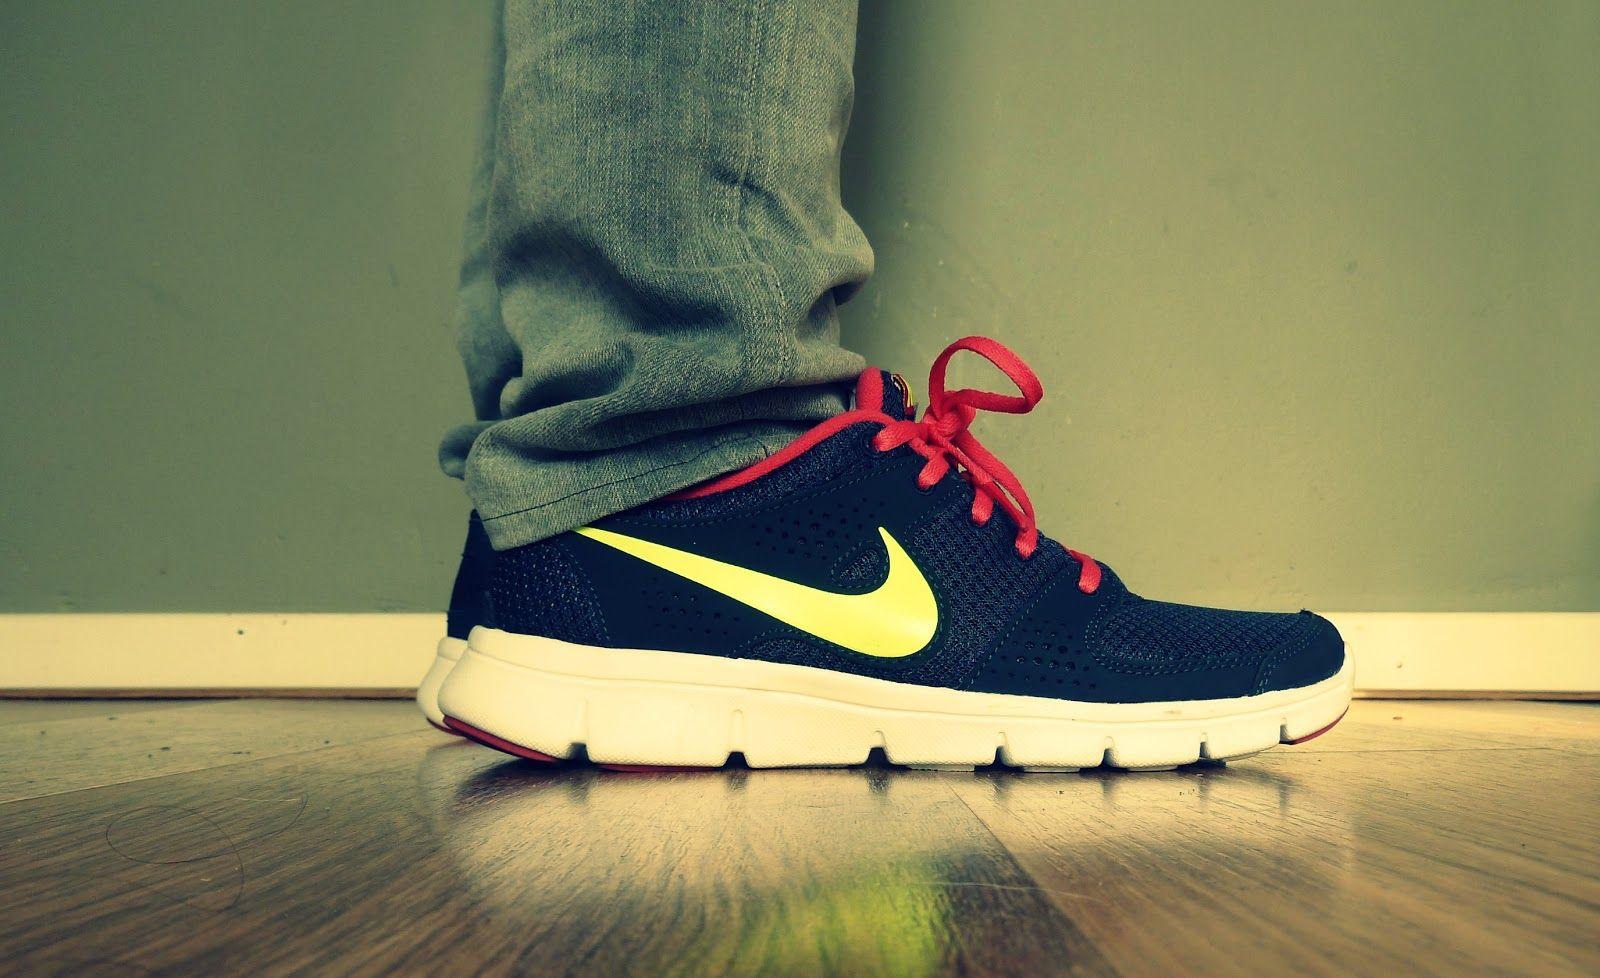 Nike Shoes Wallpapers Desktop 1600x978